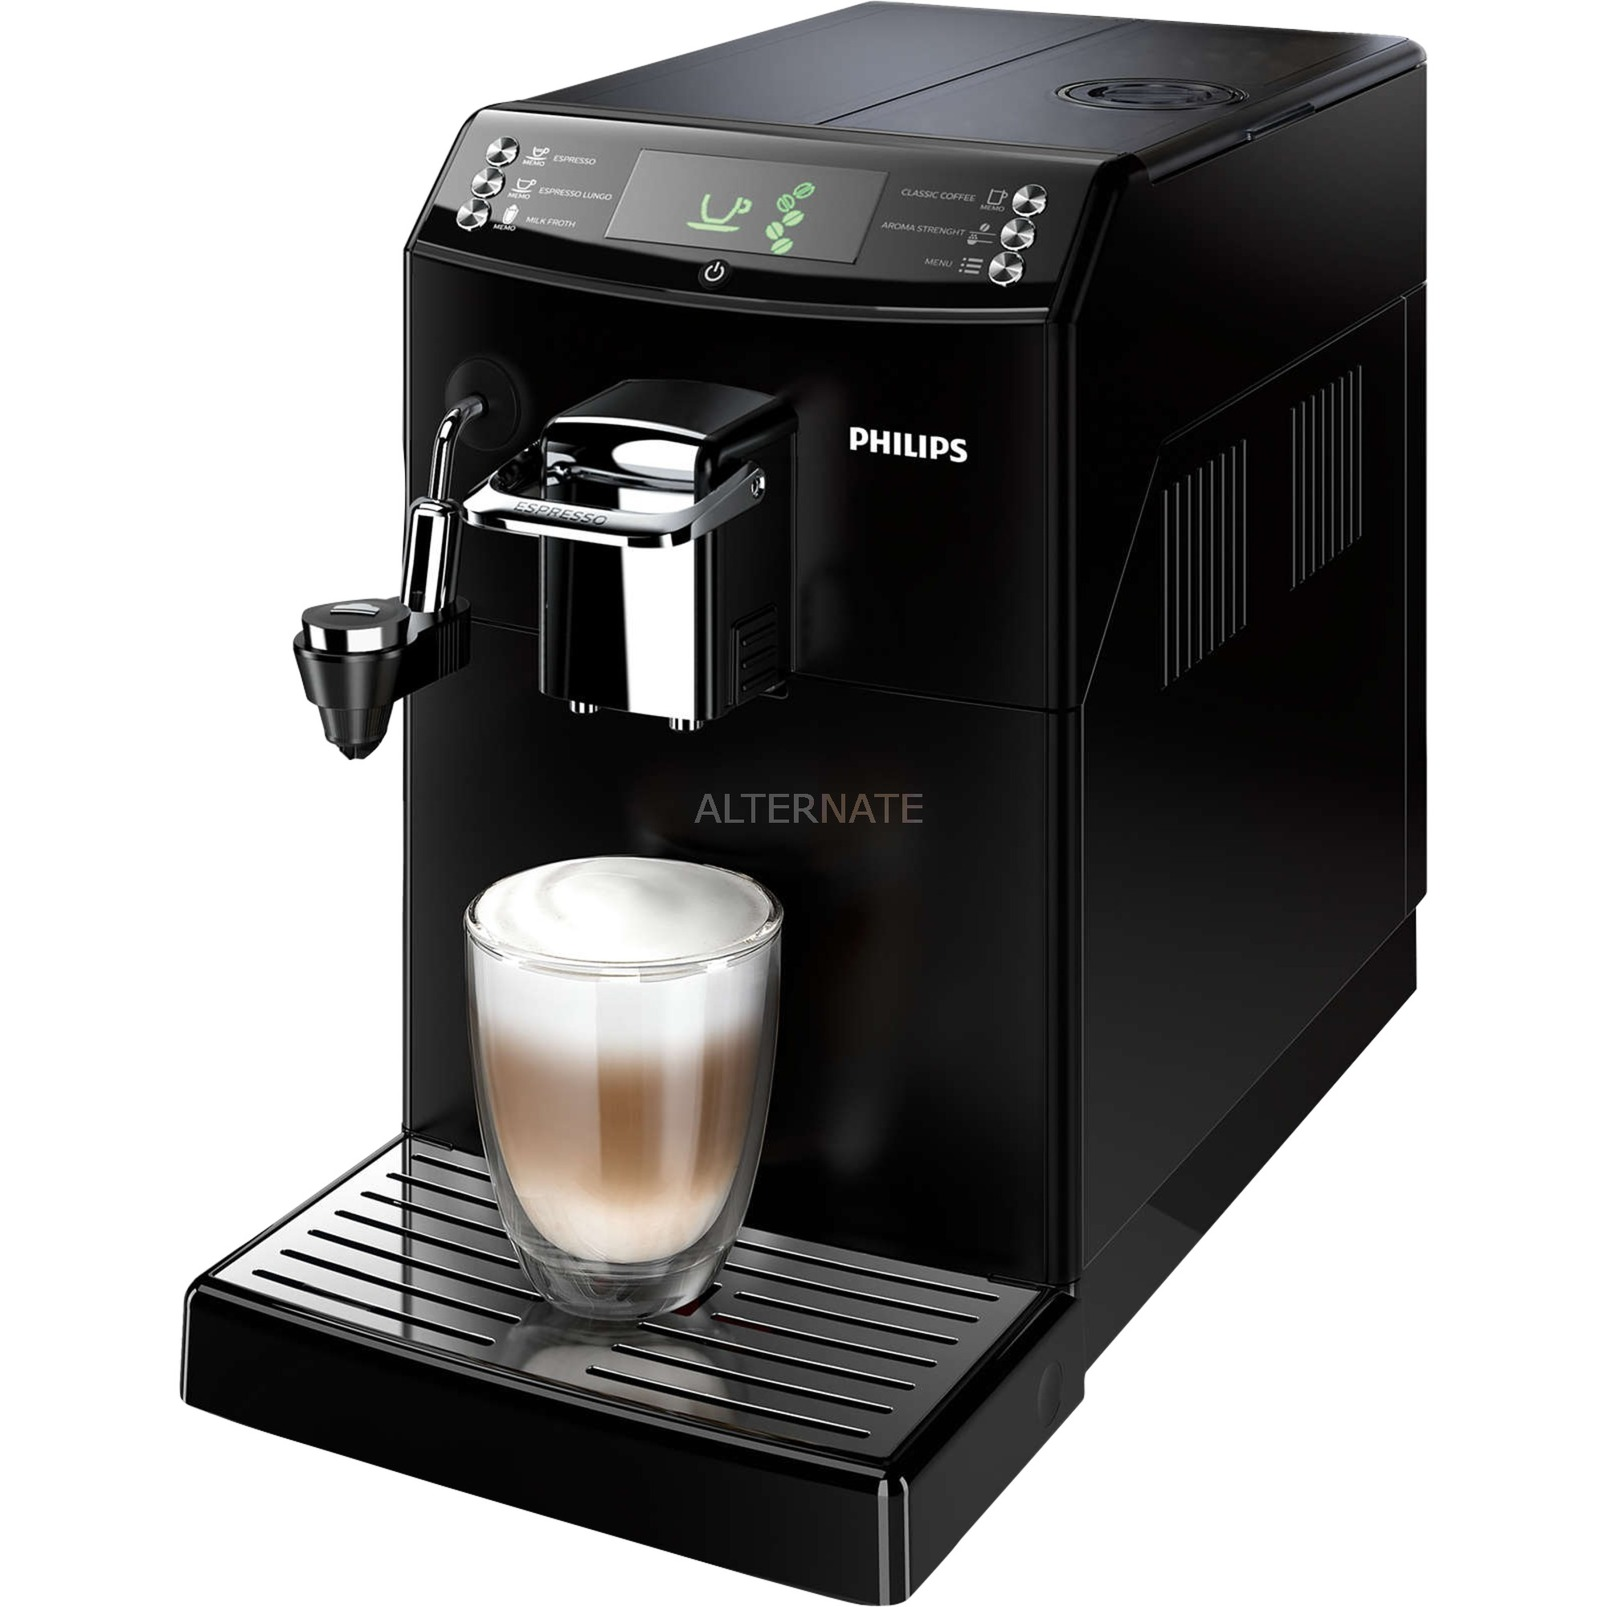 4000 series HD8844/01 Independiente Totalmente automática Máquina espresso 1.8L Negro cafetera eléctrica, Superautomática